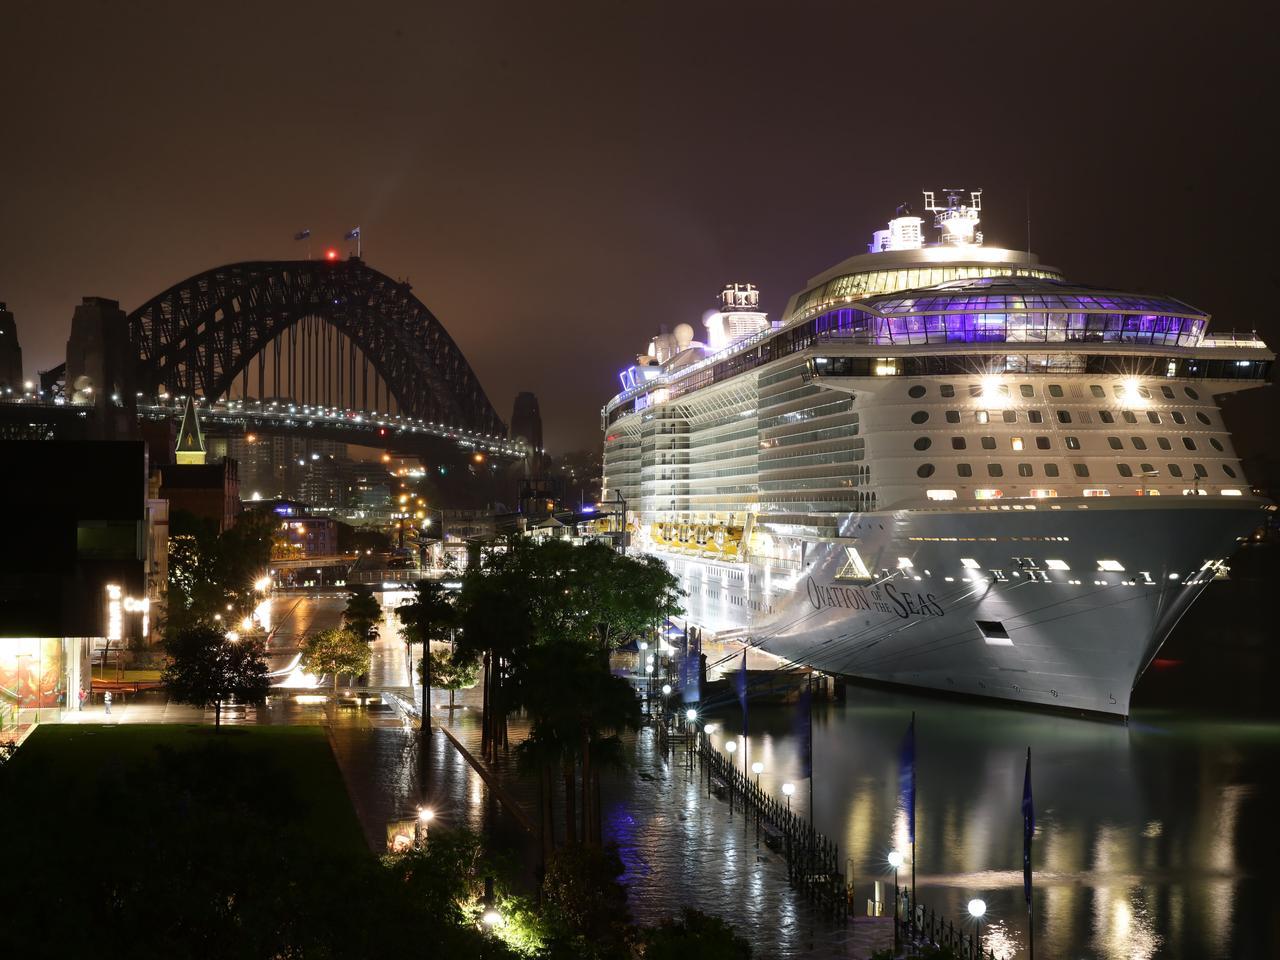 Ovation of the Seas Night Images